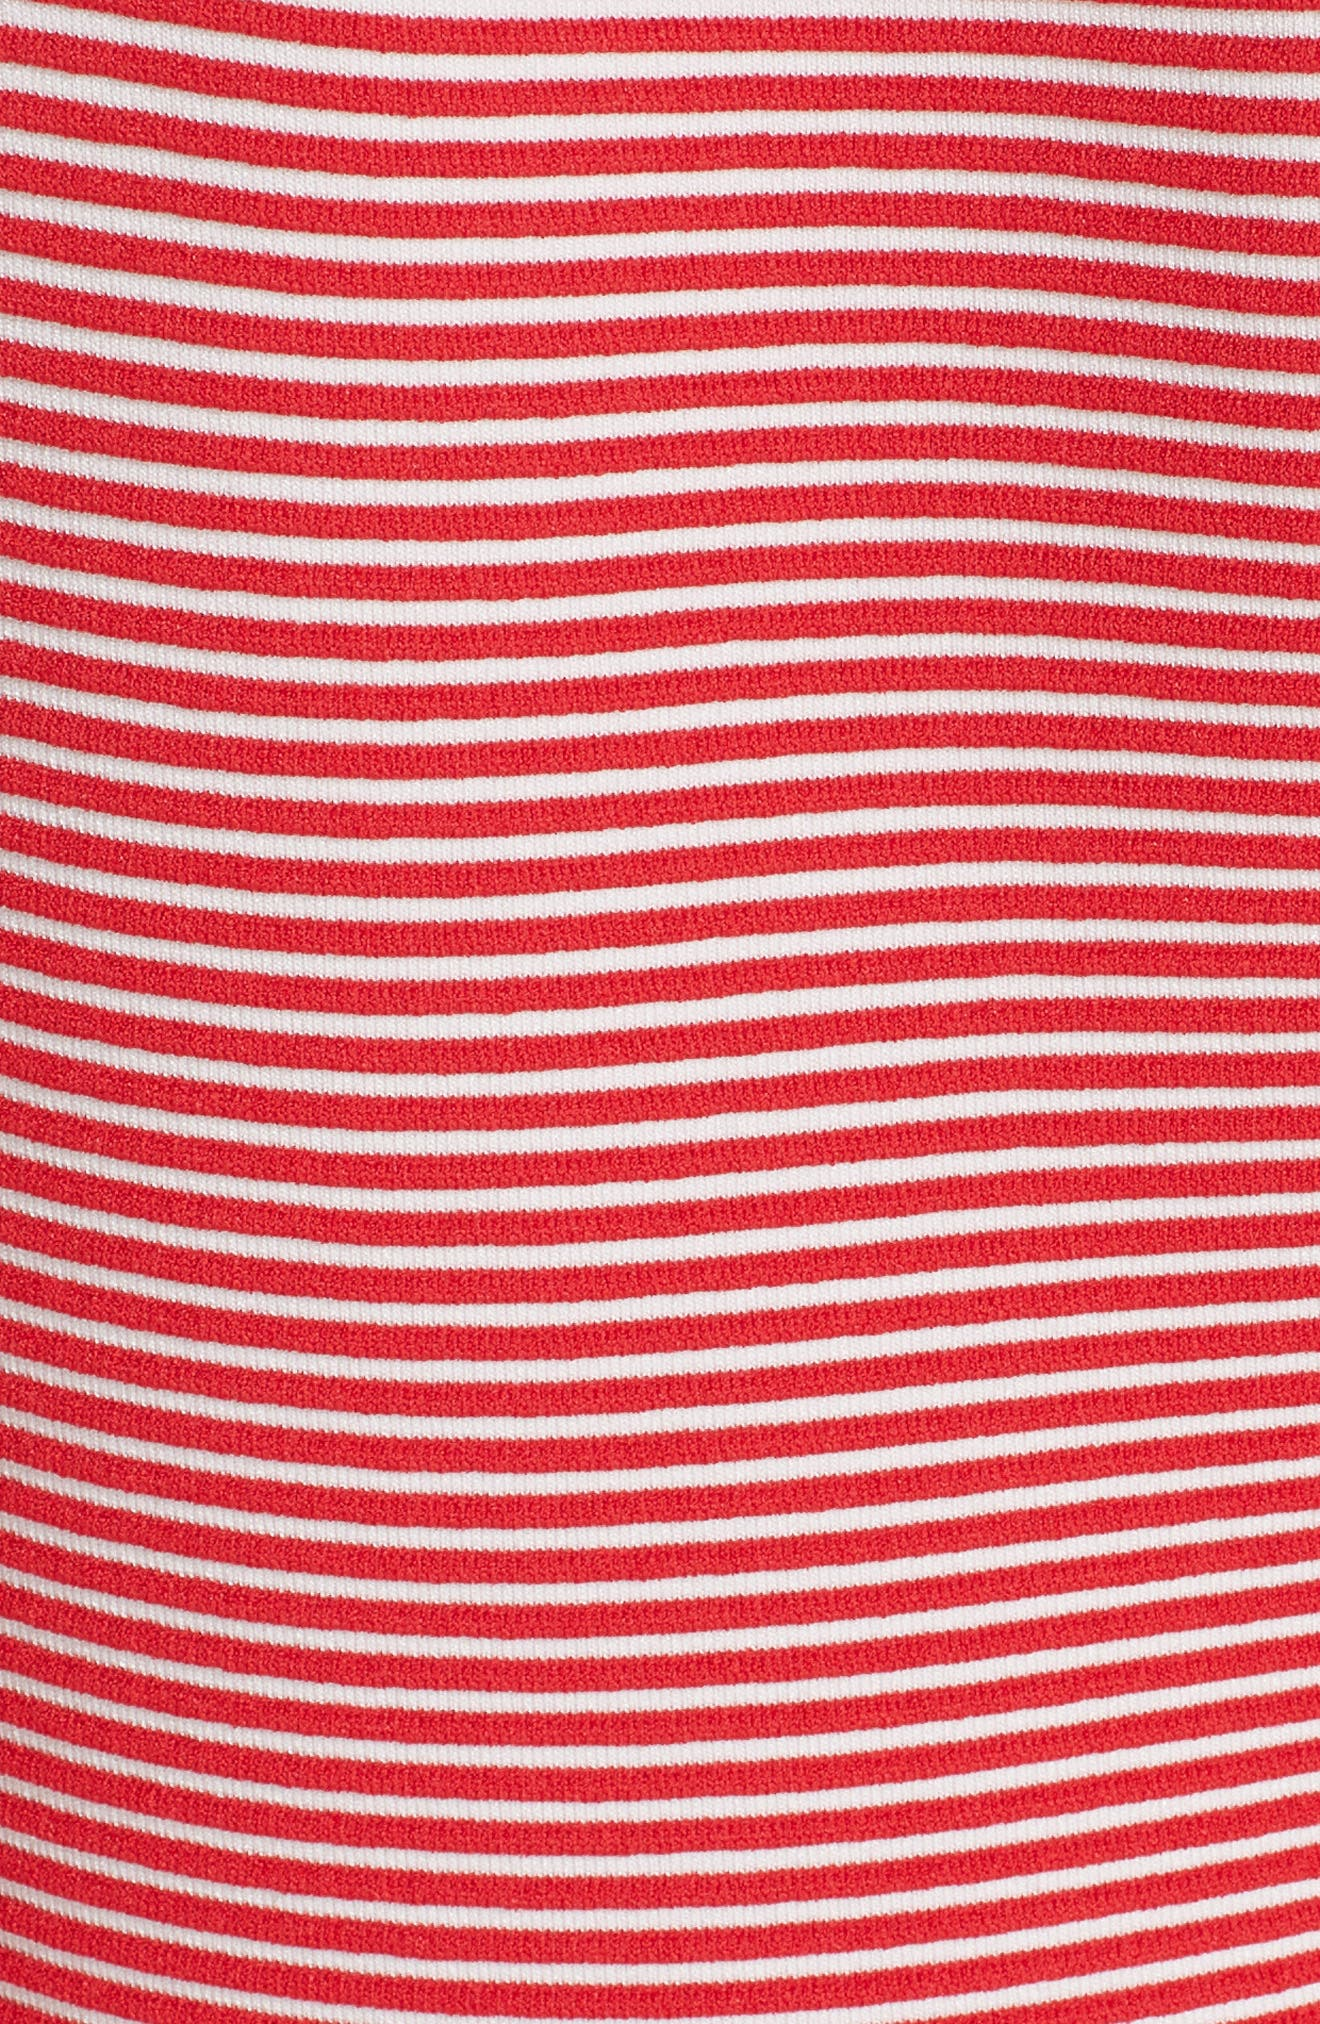 Stripe Knit Jersey Dress,                             Alternate thumbnail 5, color,                             ROSSO VULCANO